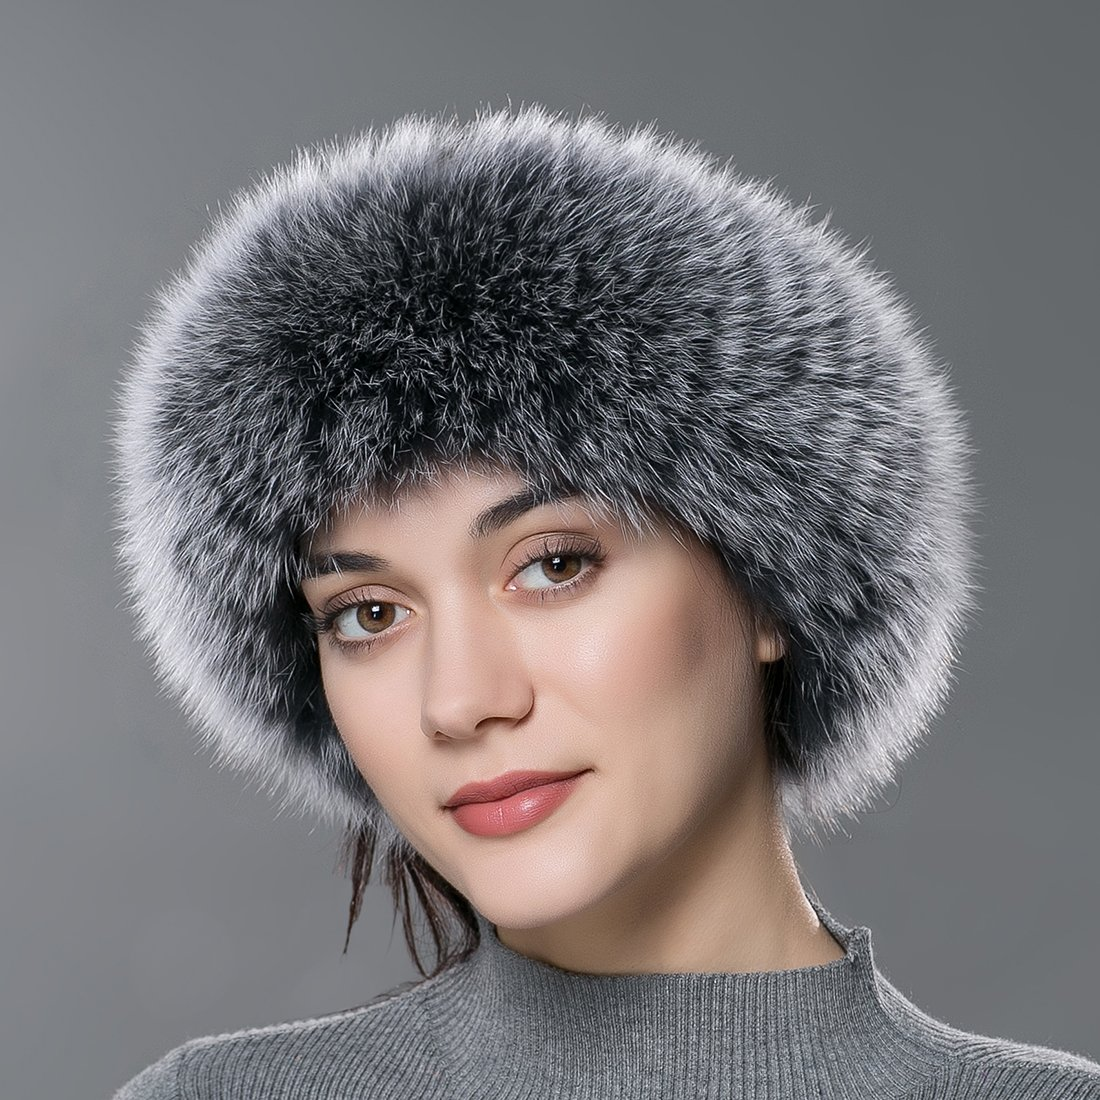 URSFUR Winter Fur Headband Women Warm Real Fox Fur Knitted Headband Earmuffs Gray Frost by URSFUR (Image #3)